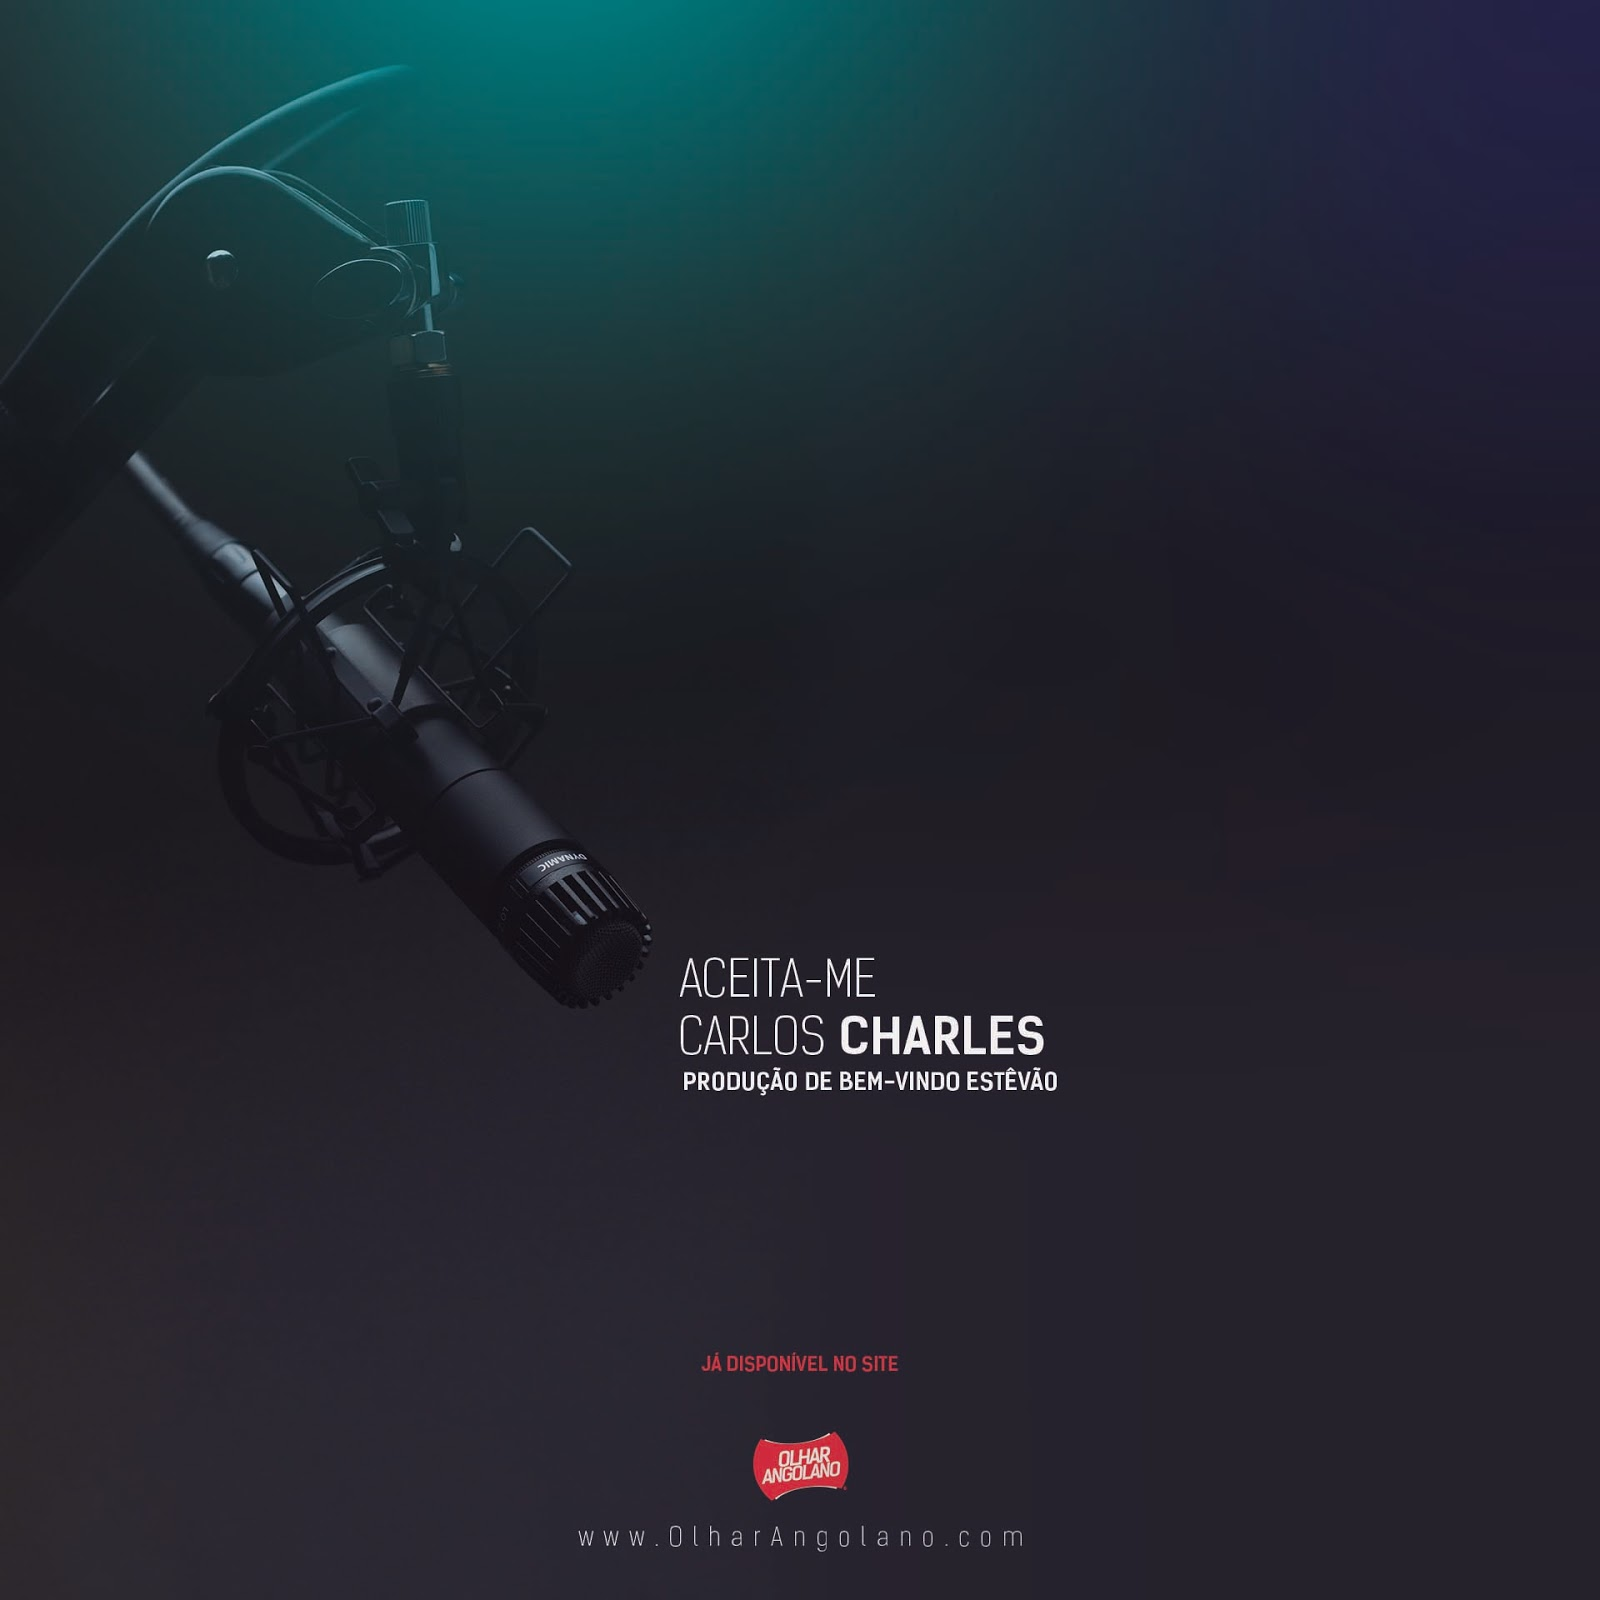 https://fanburst.com/olharangolano/aceita-me-carlos-charles/download